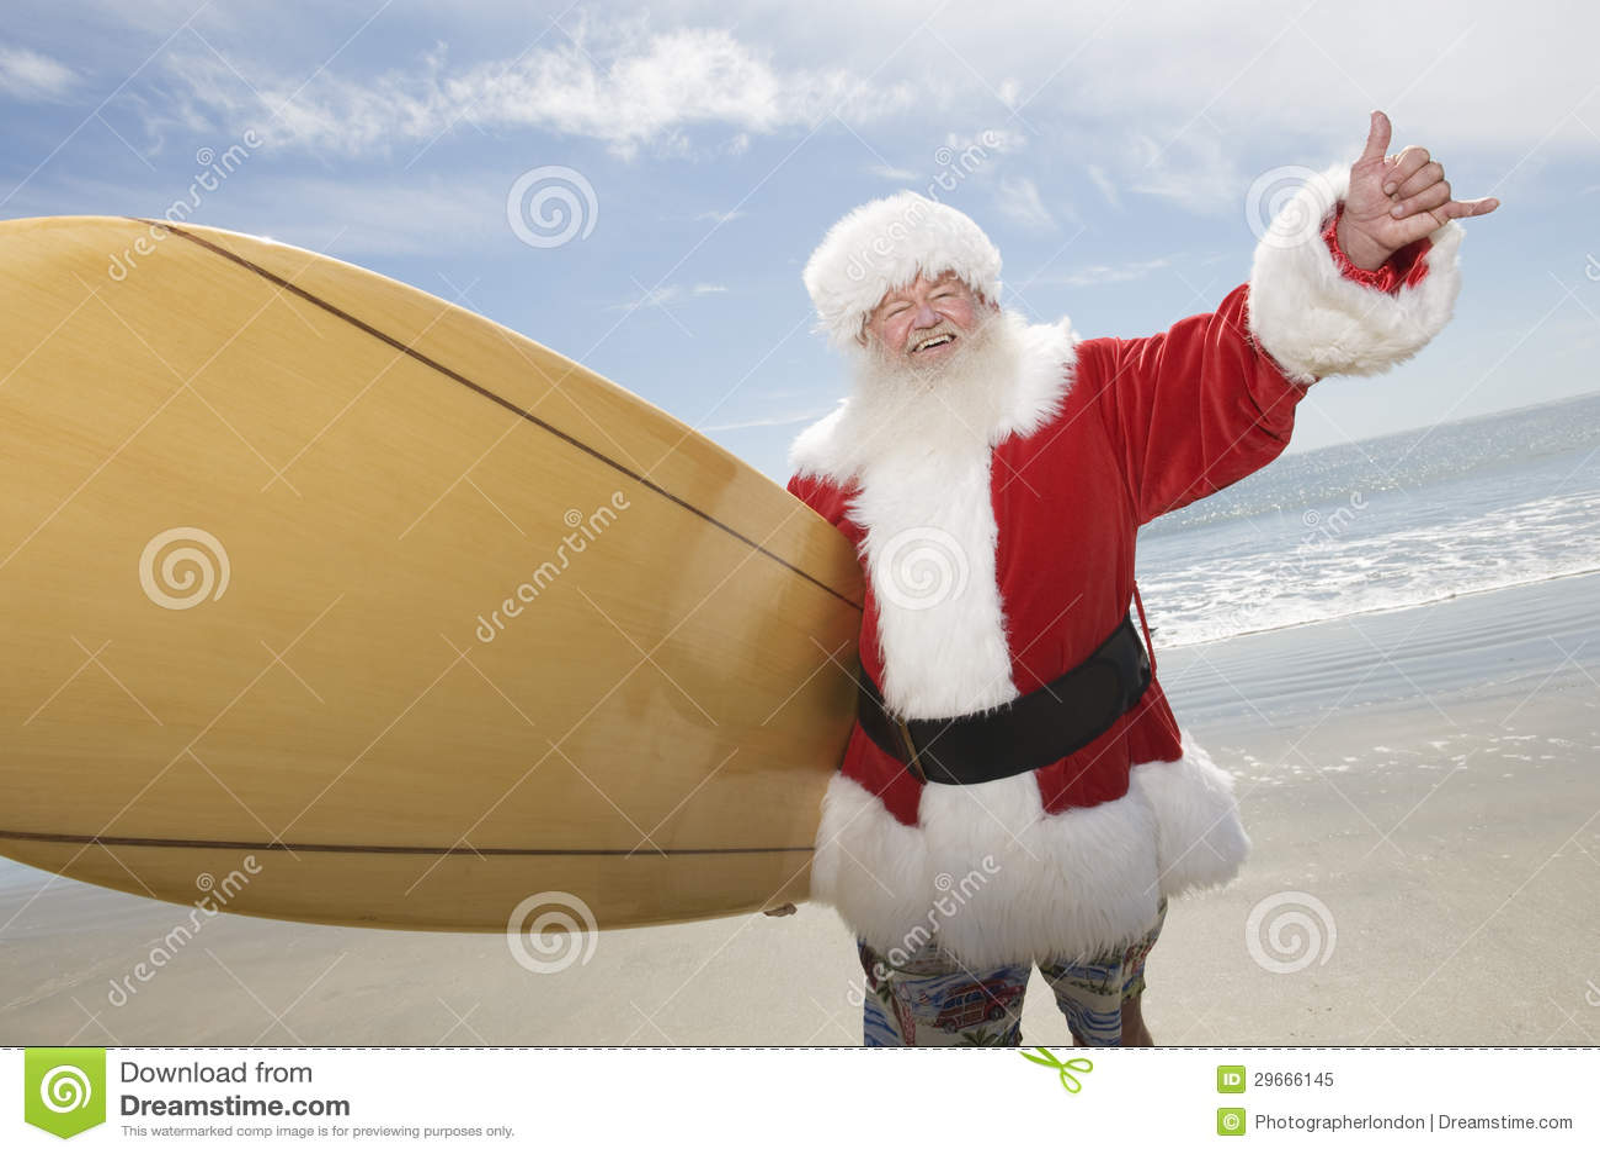 Plage de Santa Claus With Surf Board On